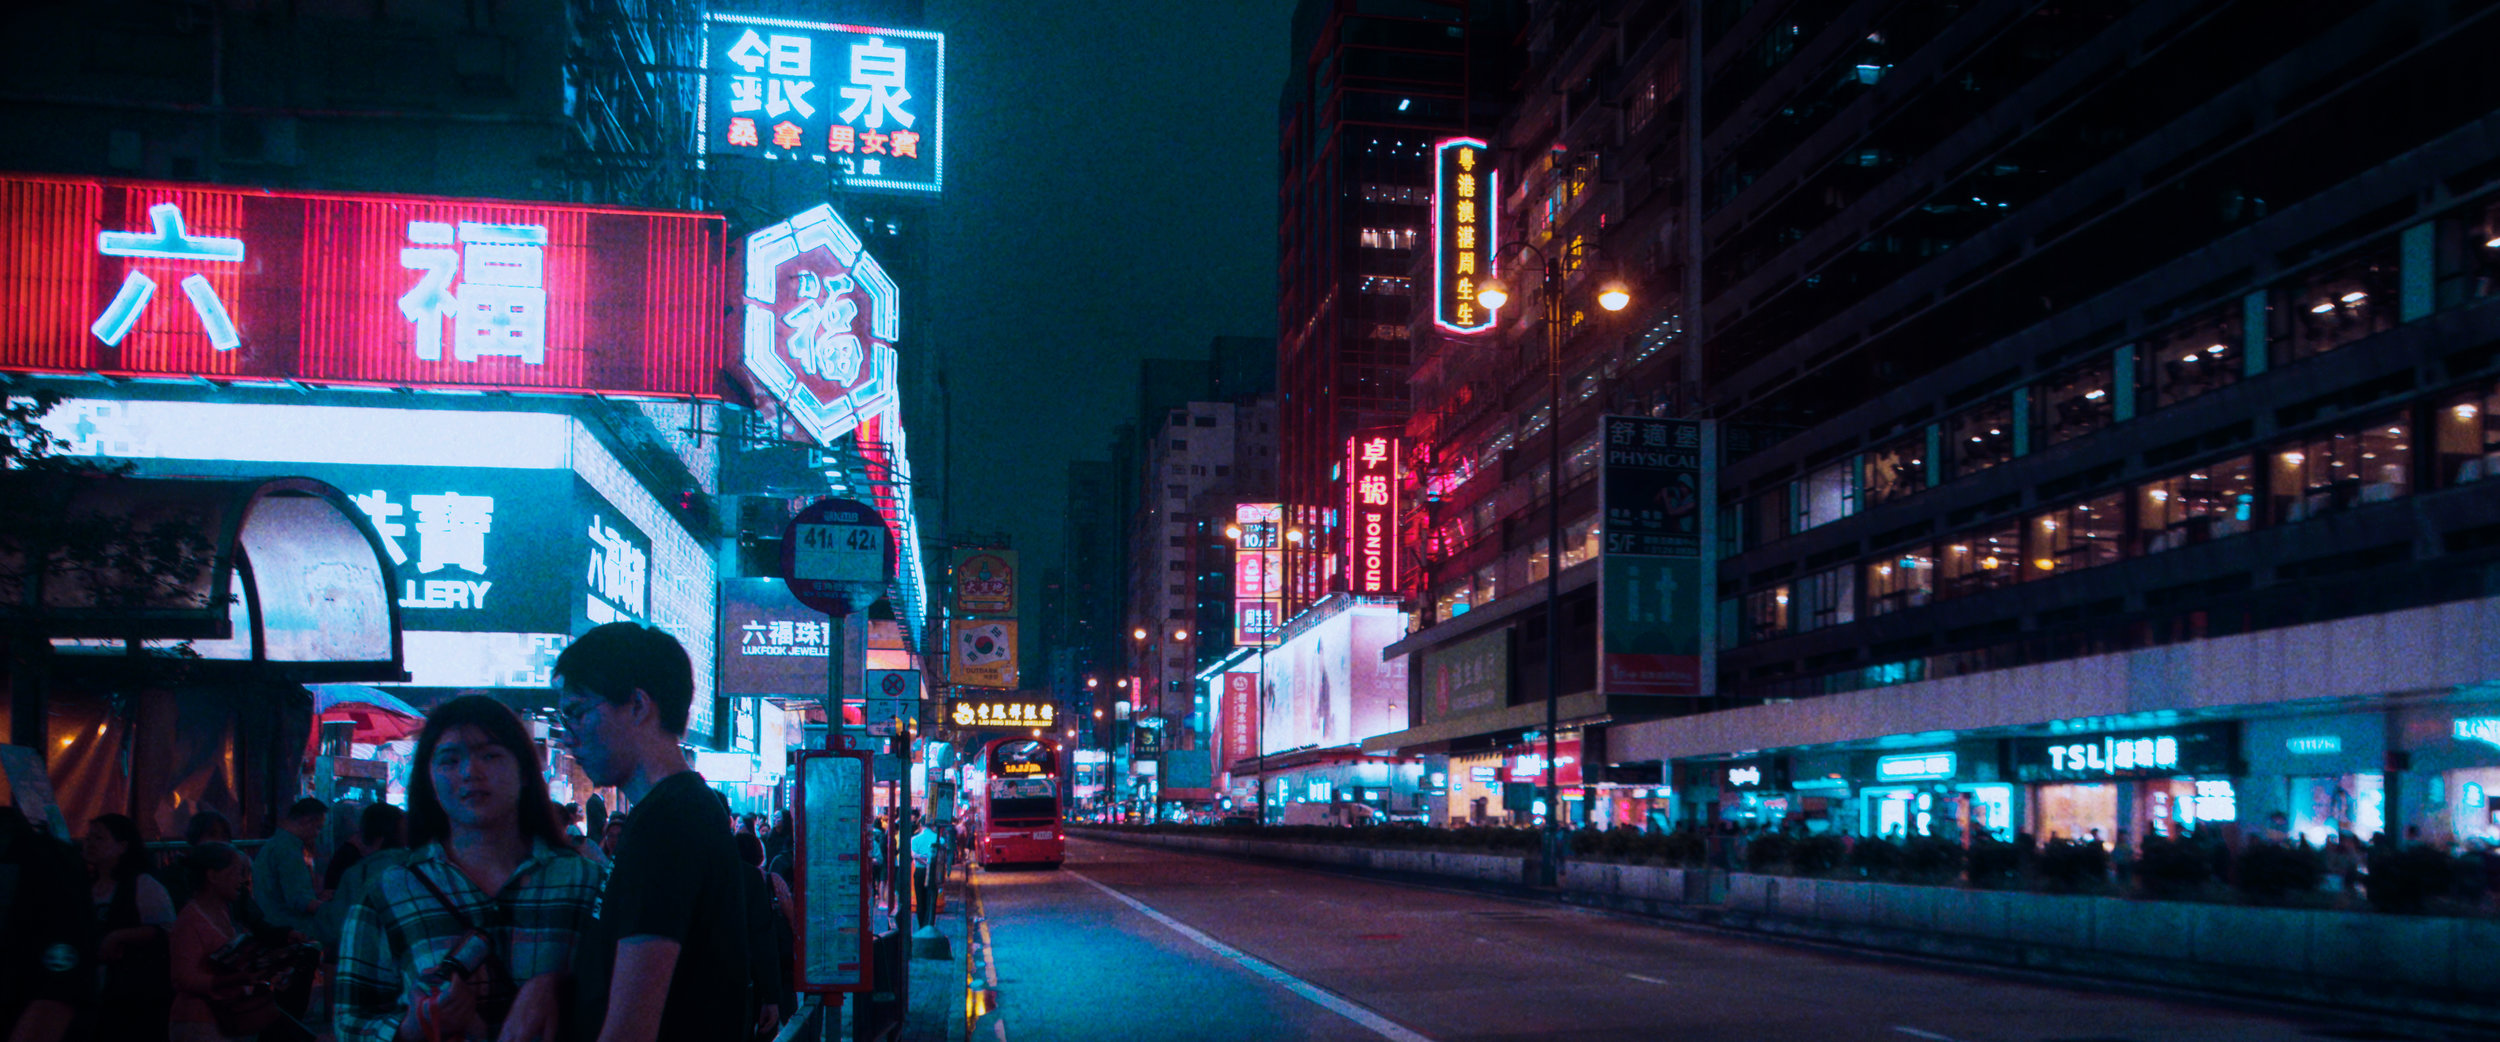 HK AMBITION_00000.jpg